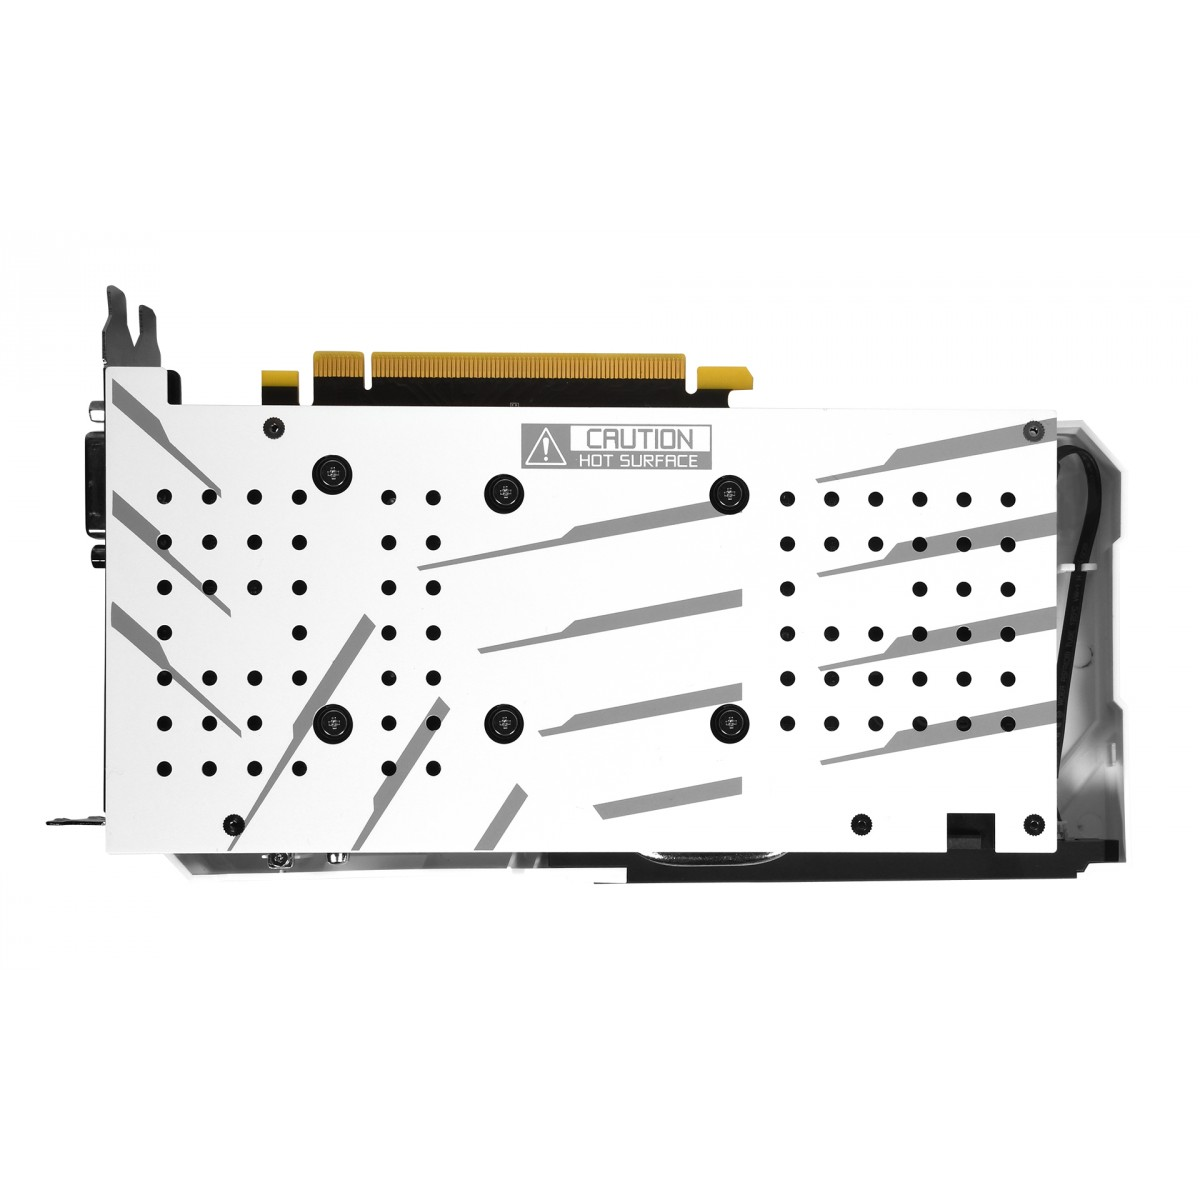 Placa de Vídeo Galax, Geforce RTX 2060 Ex White Dual (1-Click OC), 6GB, GDDR6, 192Bit, 26NRL7HPY3EW